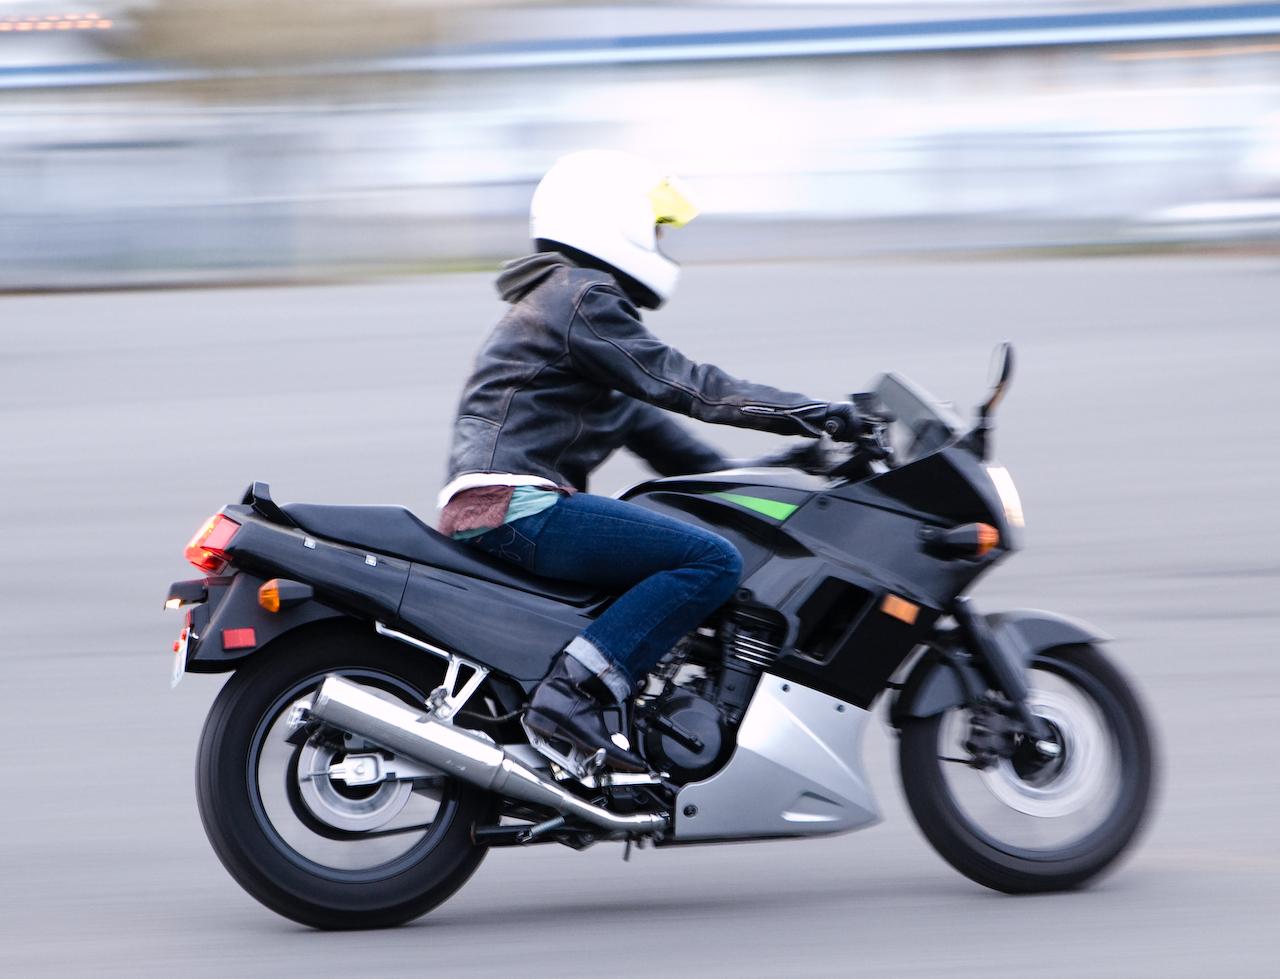 Kawasaki Bikes In India Under  Lakhs